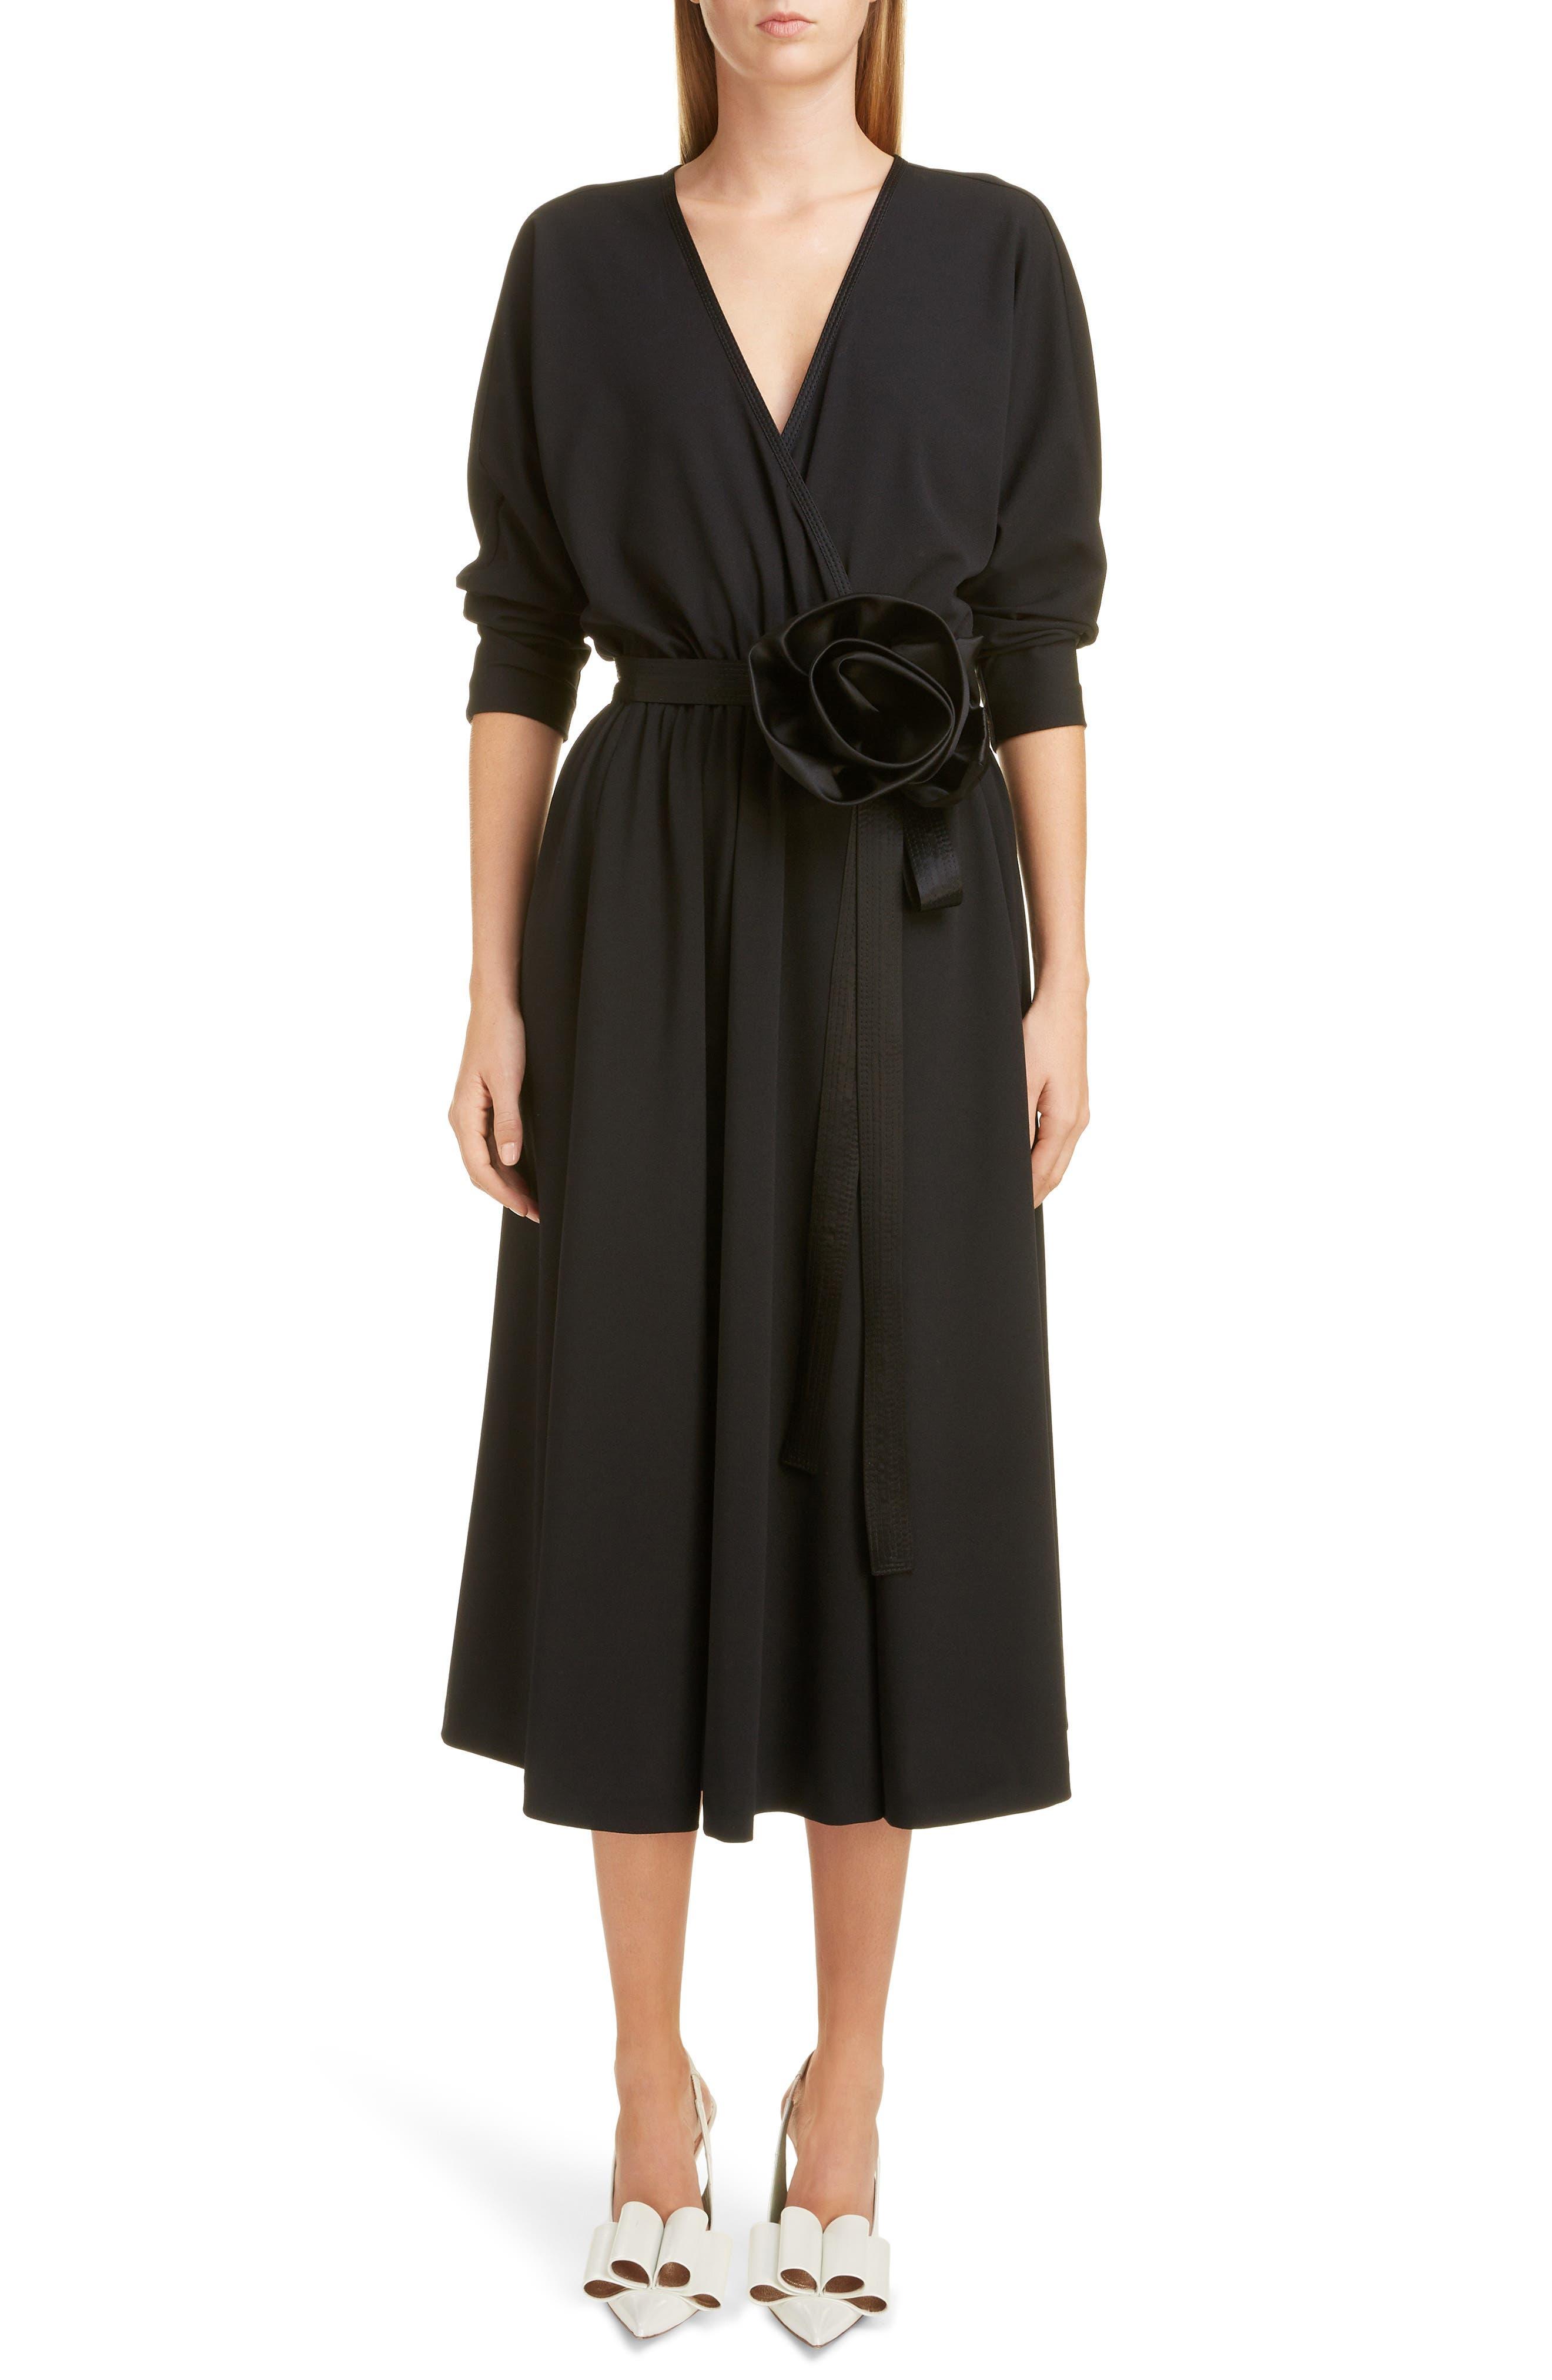 Marc Jacobs Dresses Rosette Belt Wrap Dress